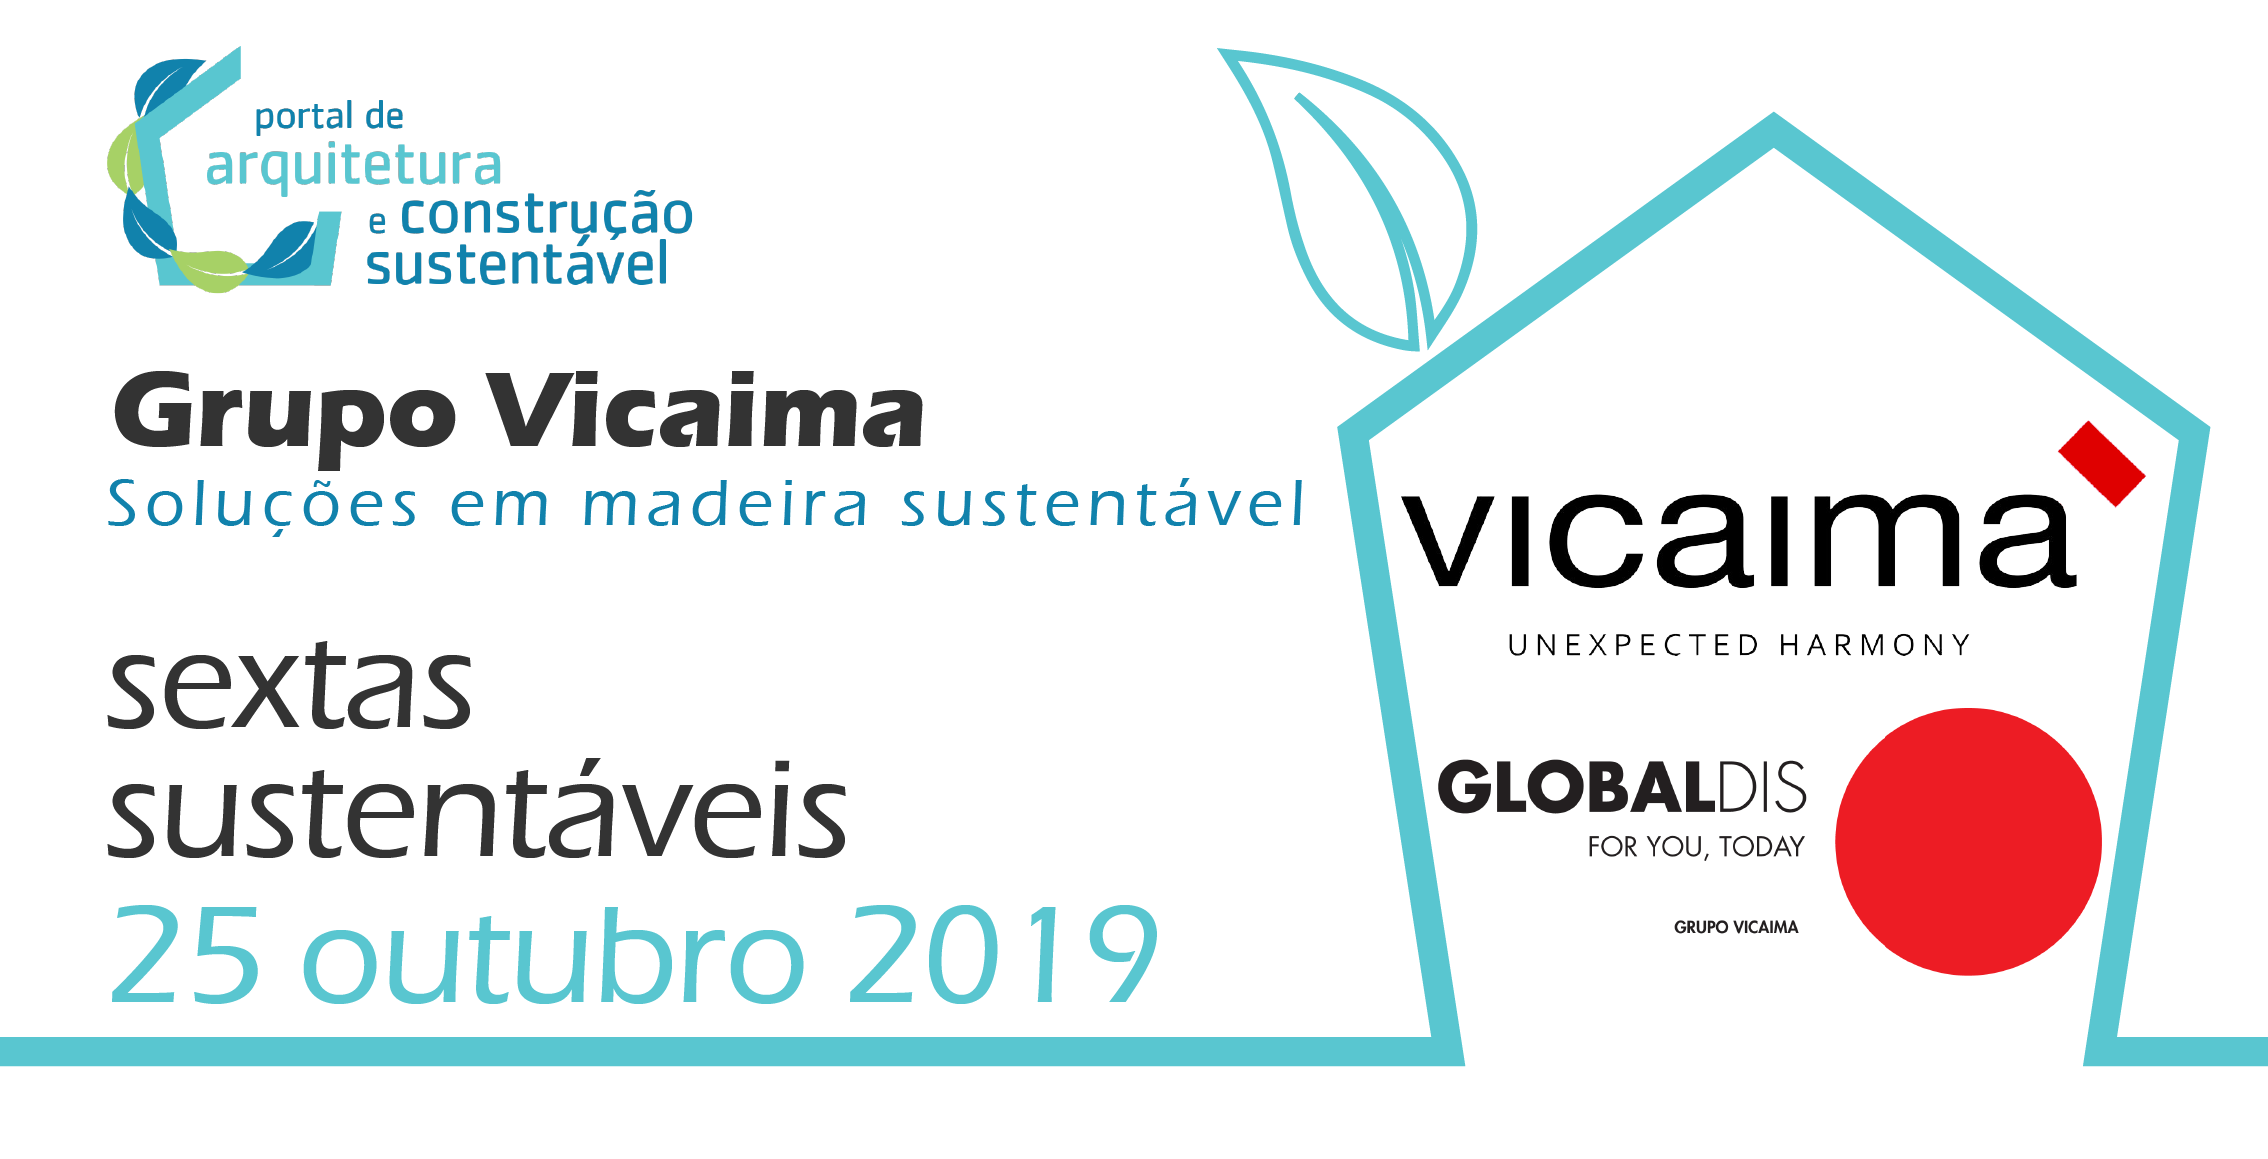 SEXTA SUSTENTÁVEL   VICAIMA & GLOBALDIS